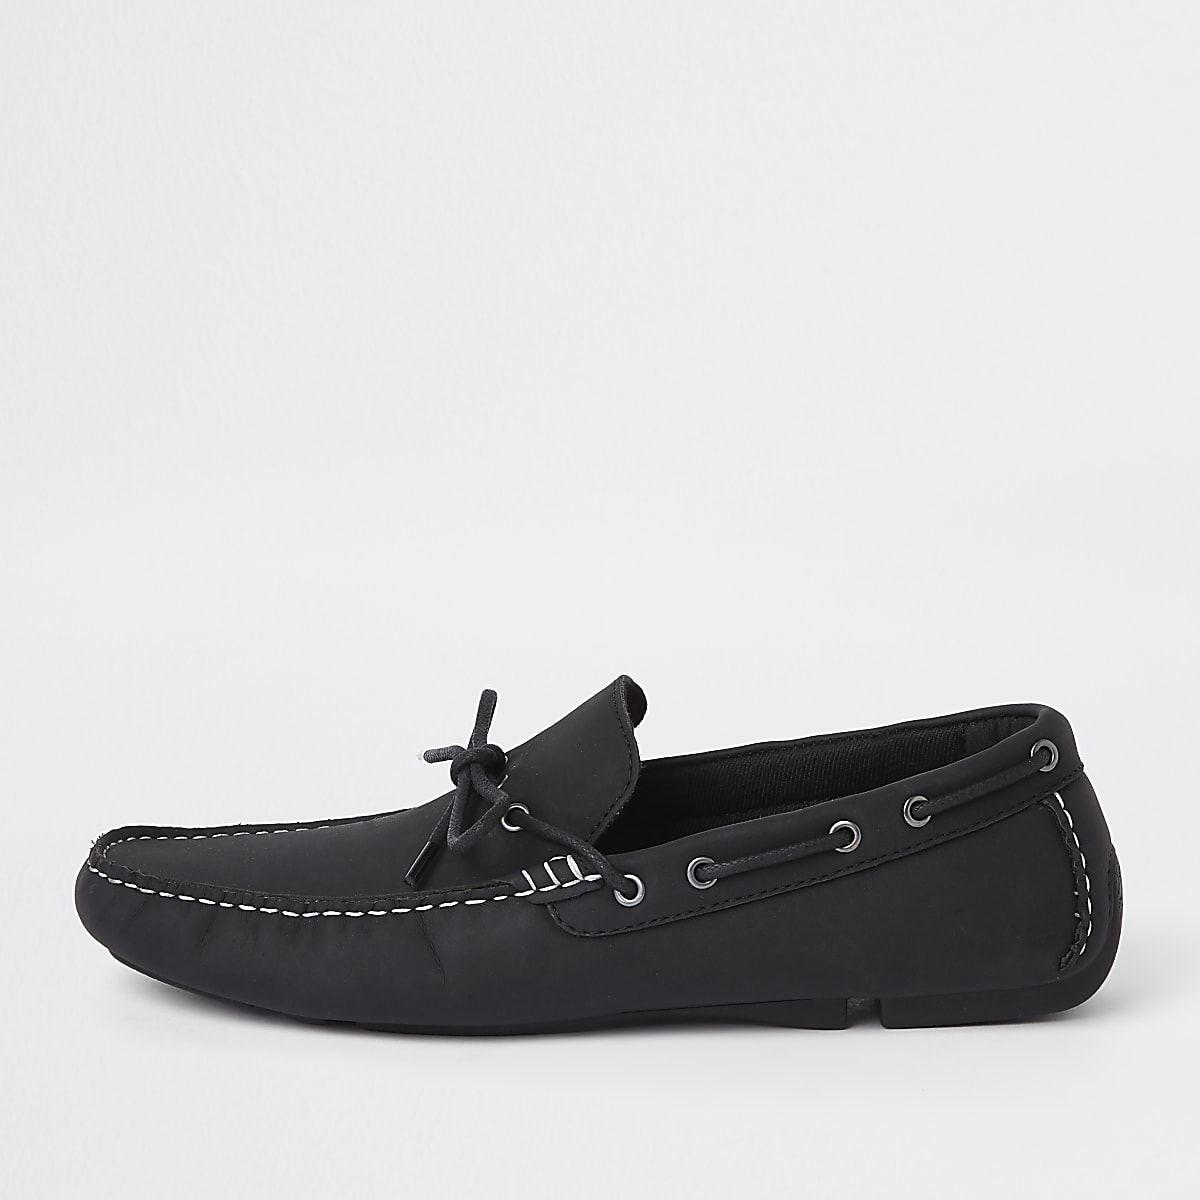 Black driving shoes